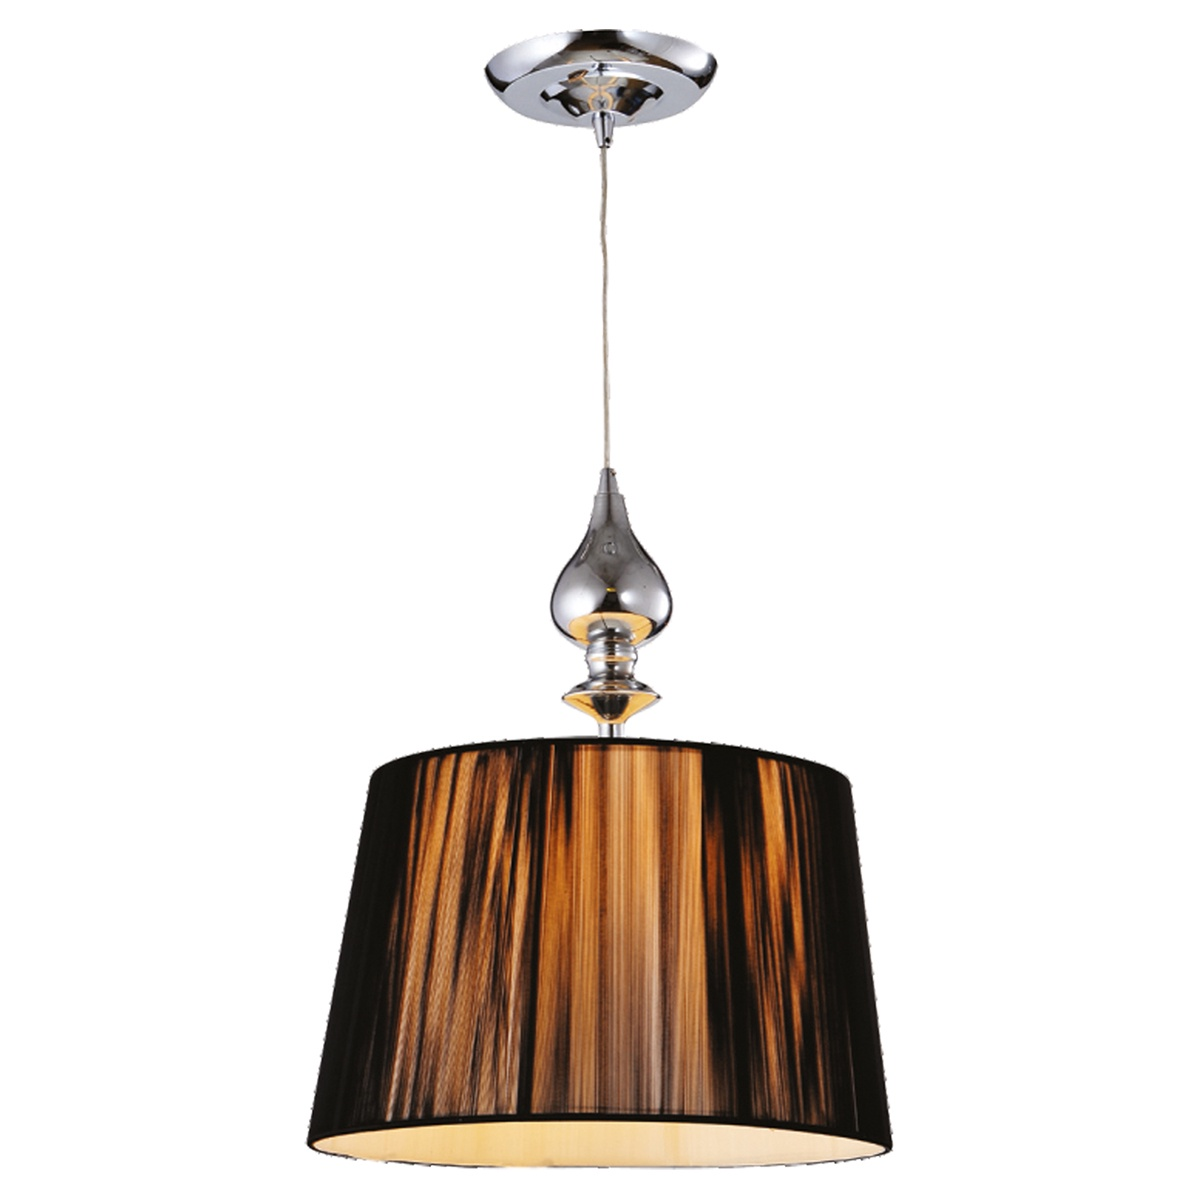 Подвесной светильник Collezioni Black, E27, 1x60Вт Вт цены онлайн